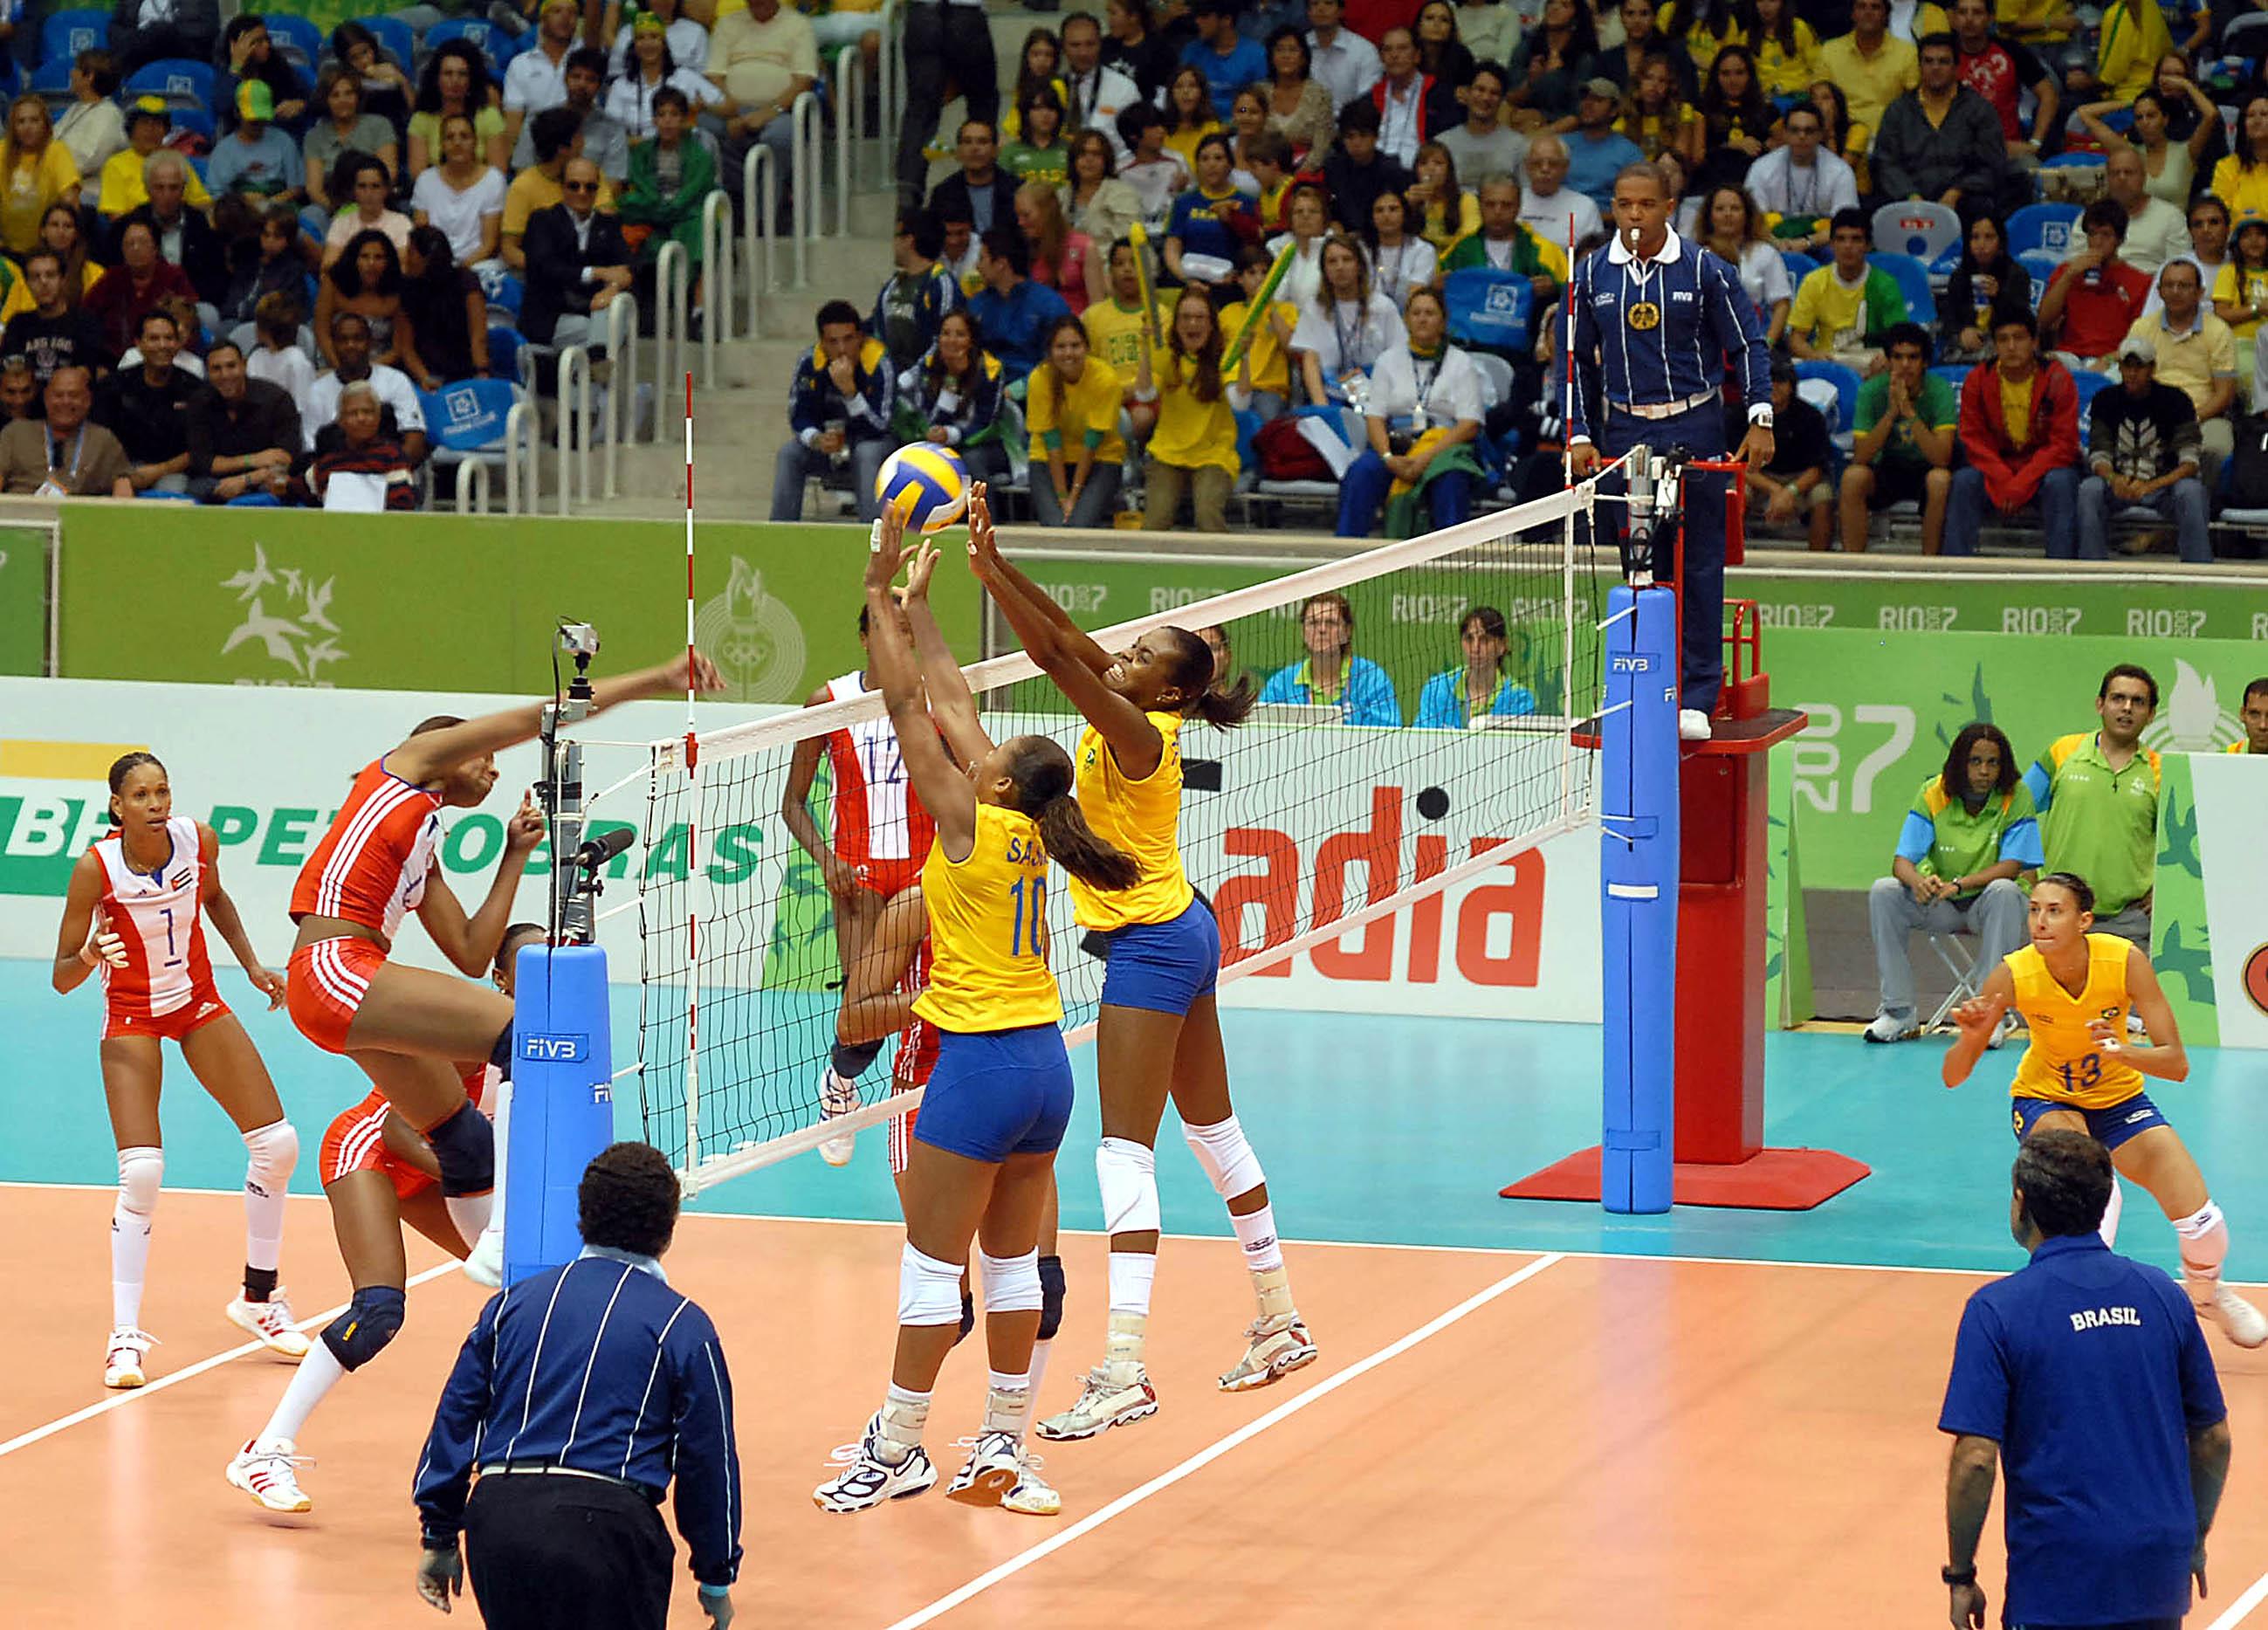 File:Women's Volleyball - BRA vs. CUB.jpg